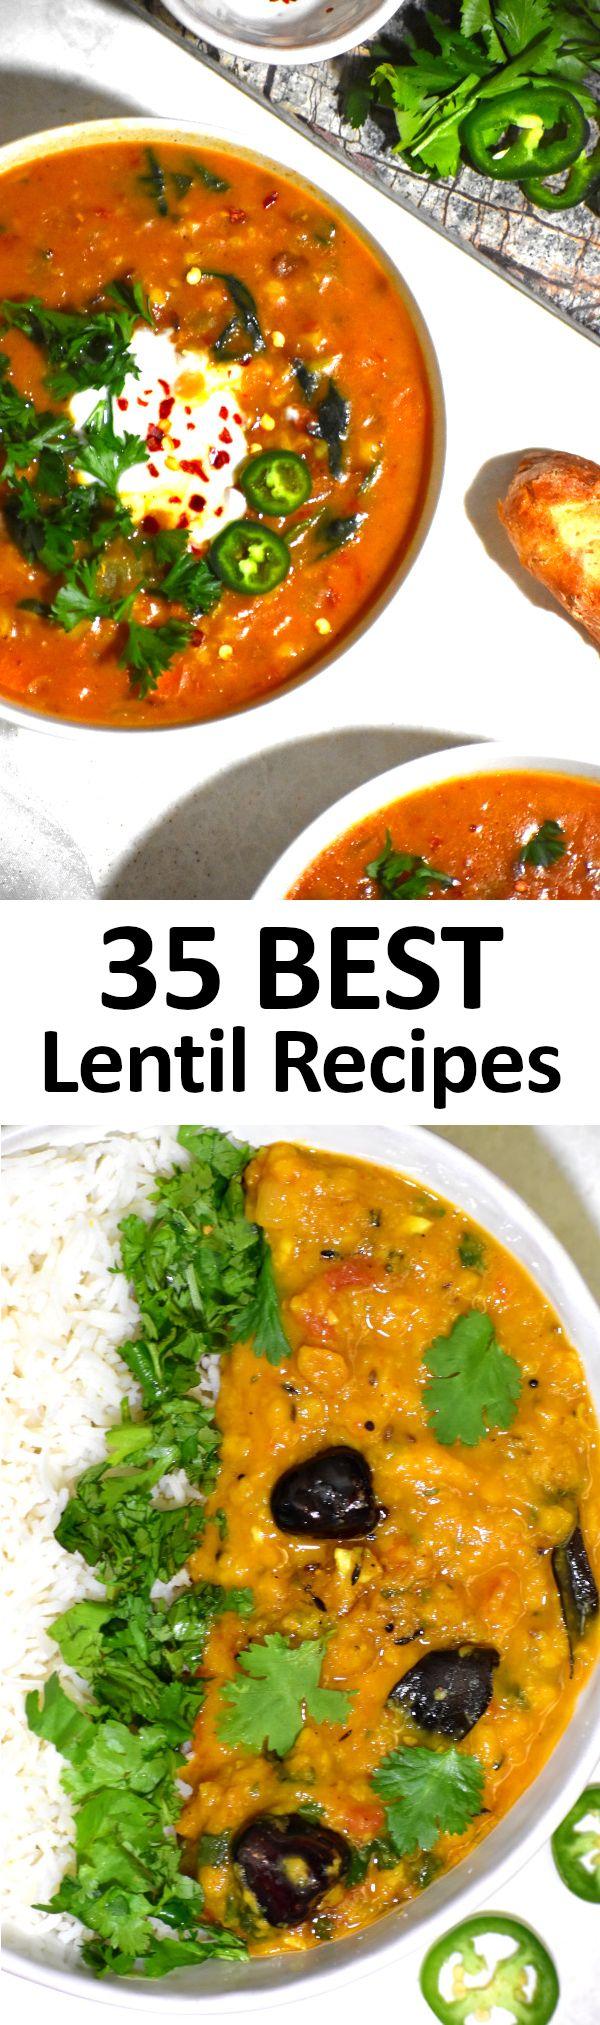 35 BEST Lentil Recipes